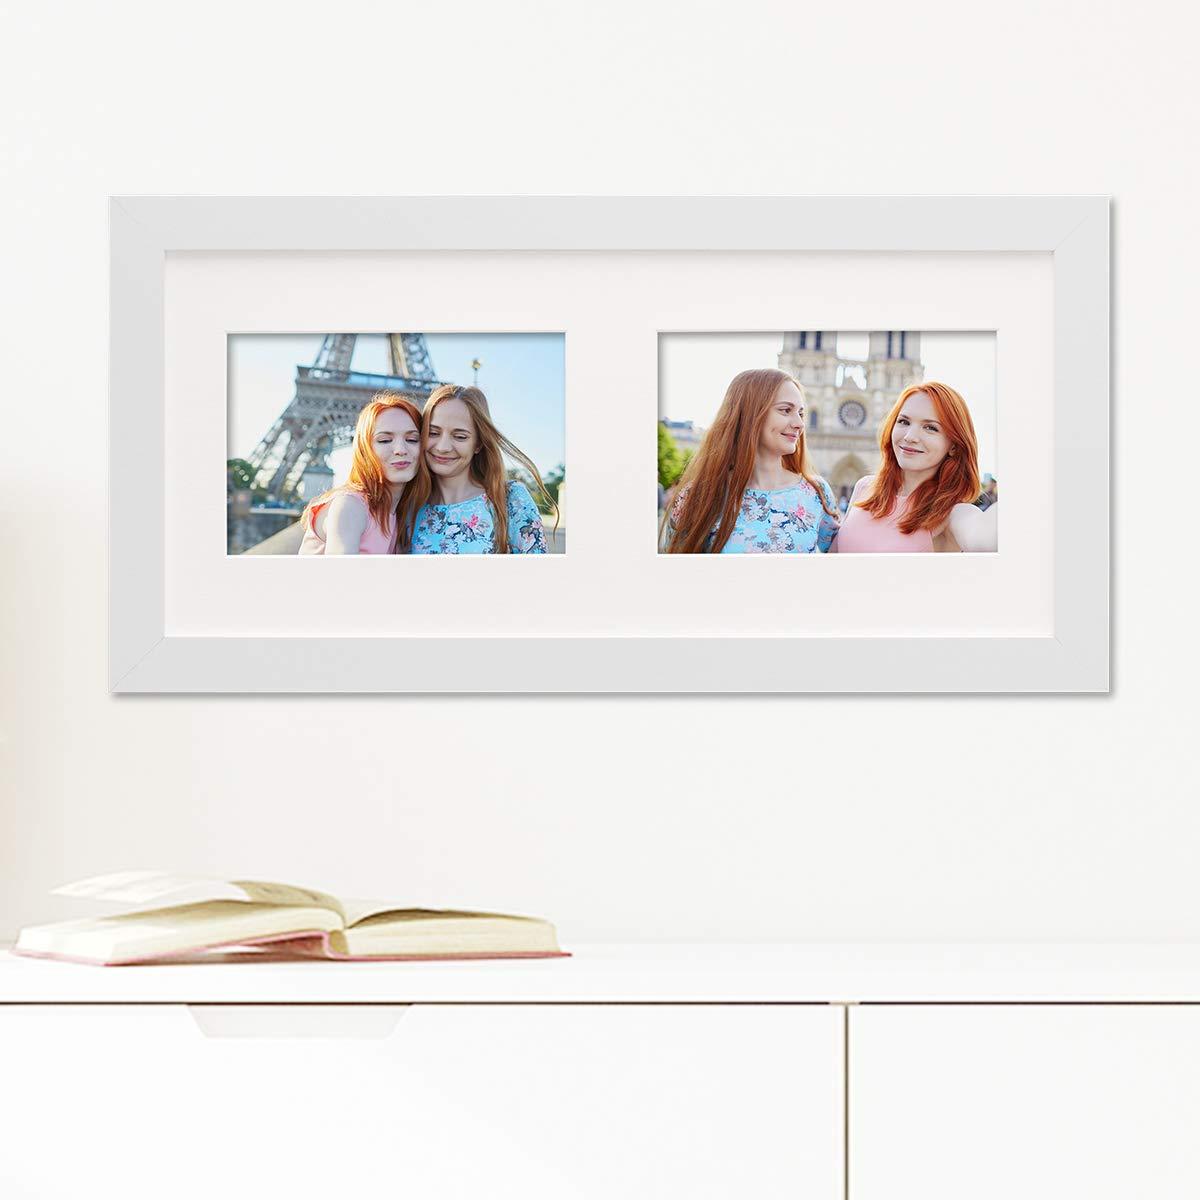 Amazon.de: PHOTOLINI Fotocollage-Bilderrahmen Modern Weiss aus MDF ...